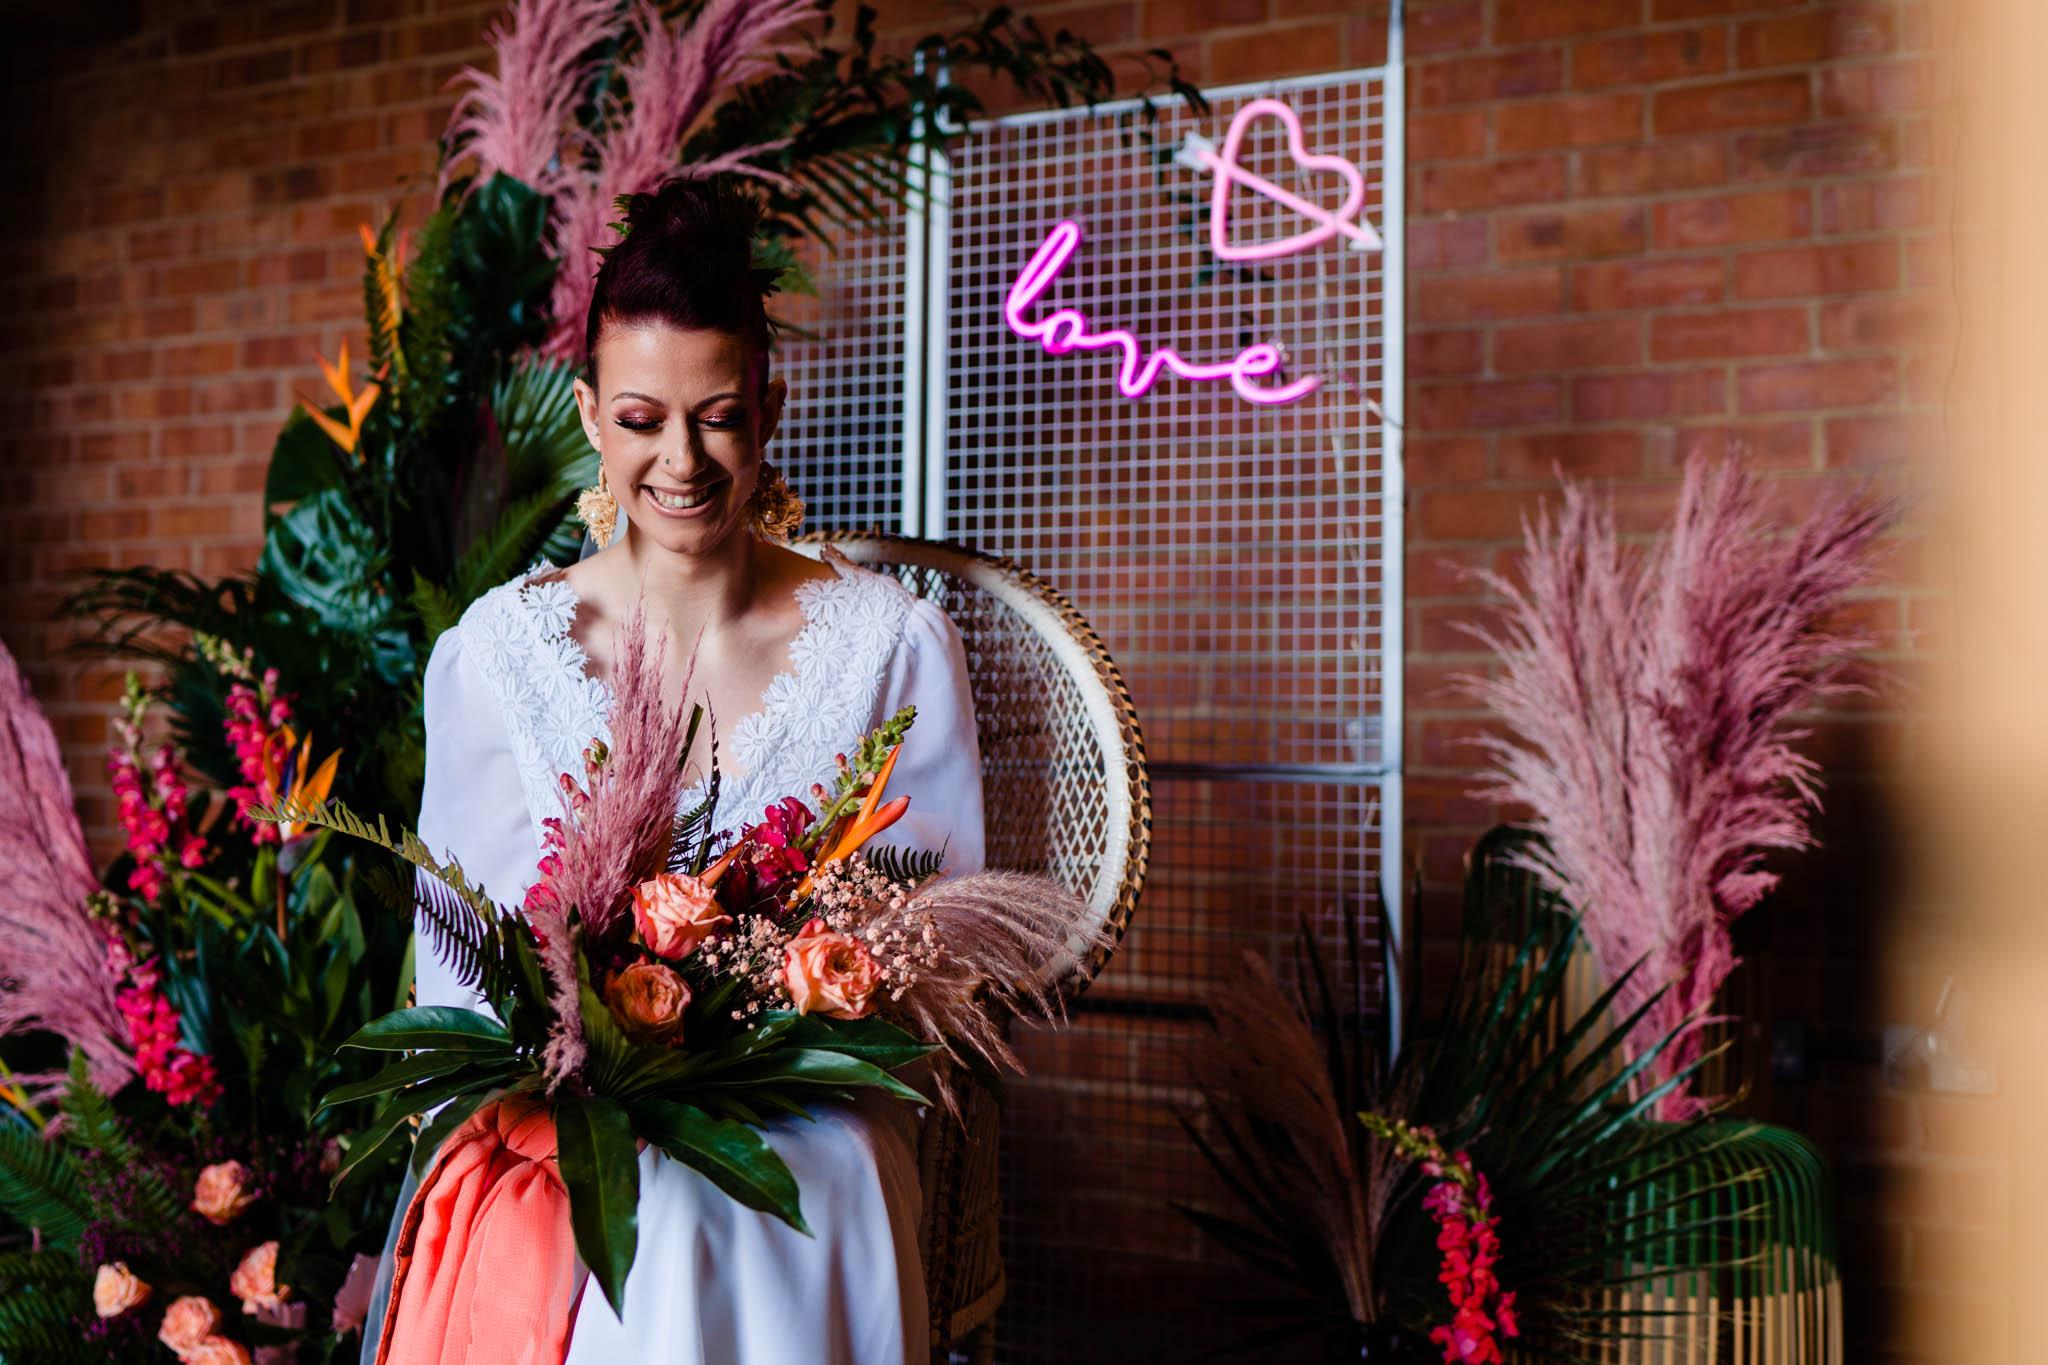 modern wedding styling - modern tropical wedding - modern wedding - modern bride - east midlands wedding planner